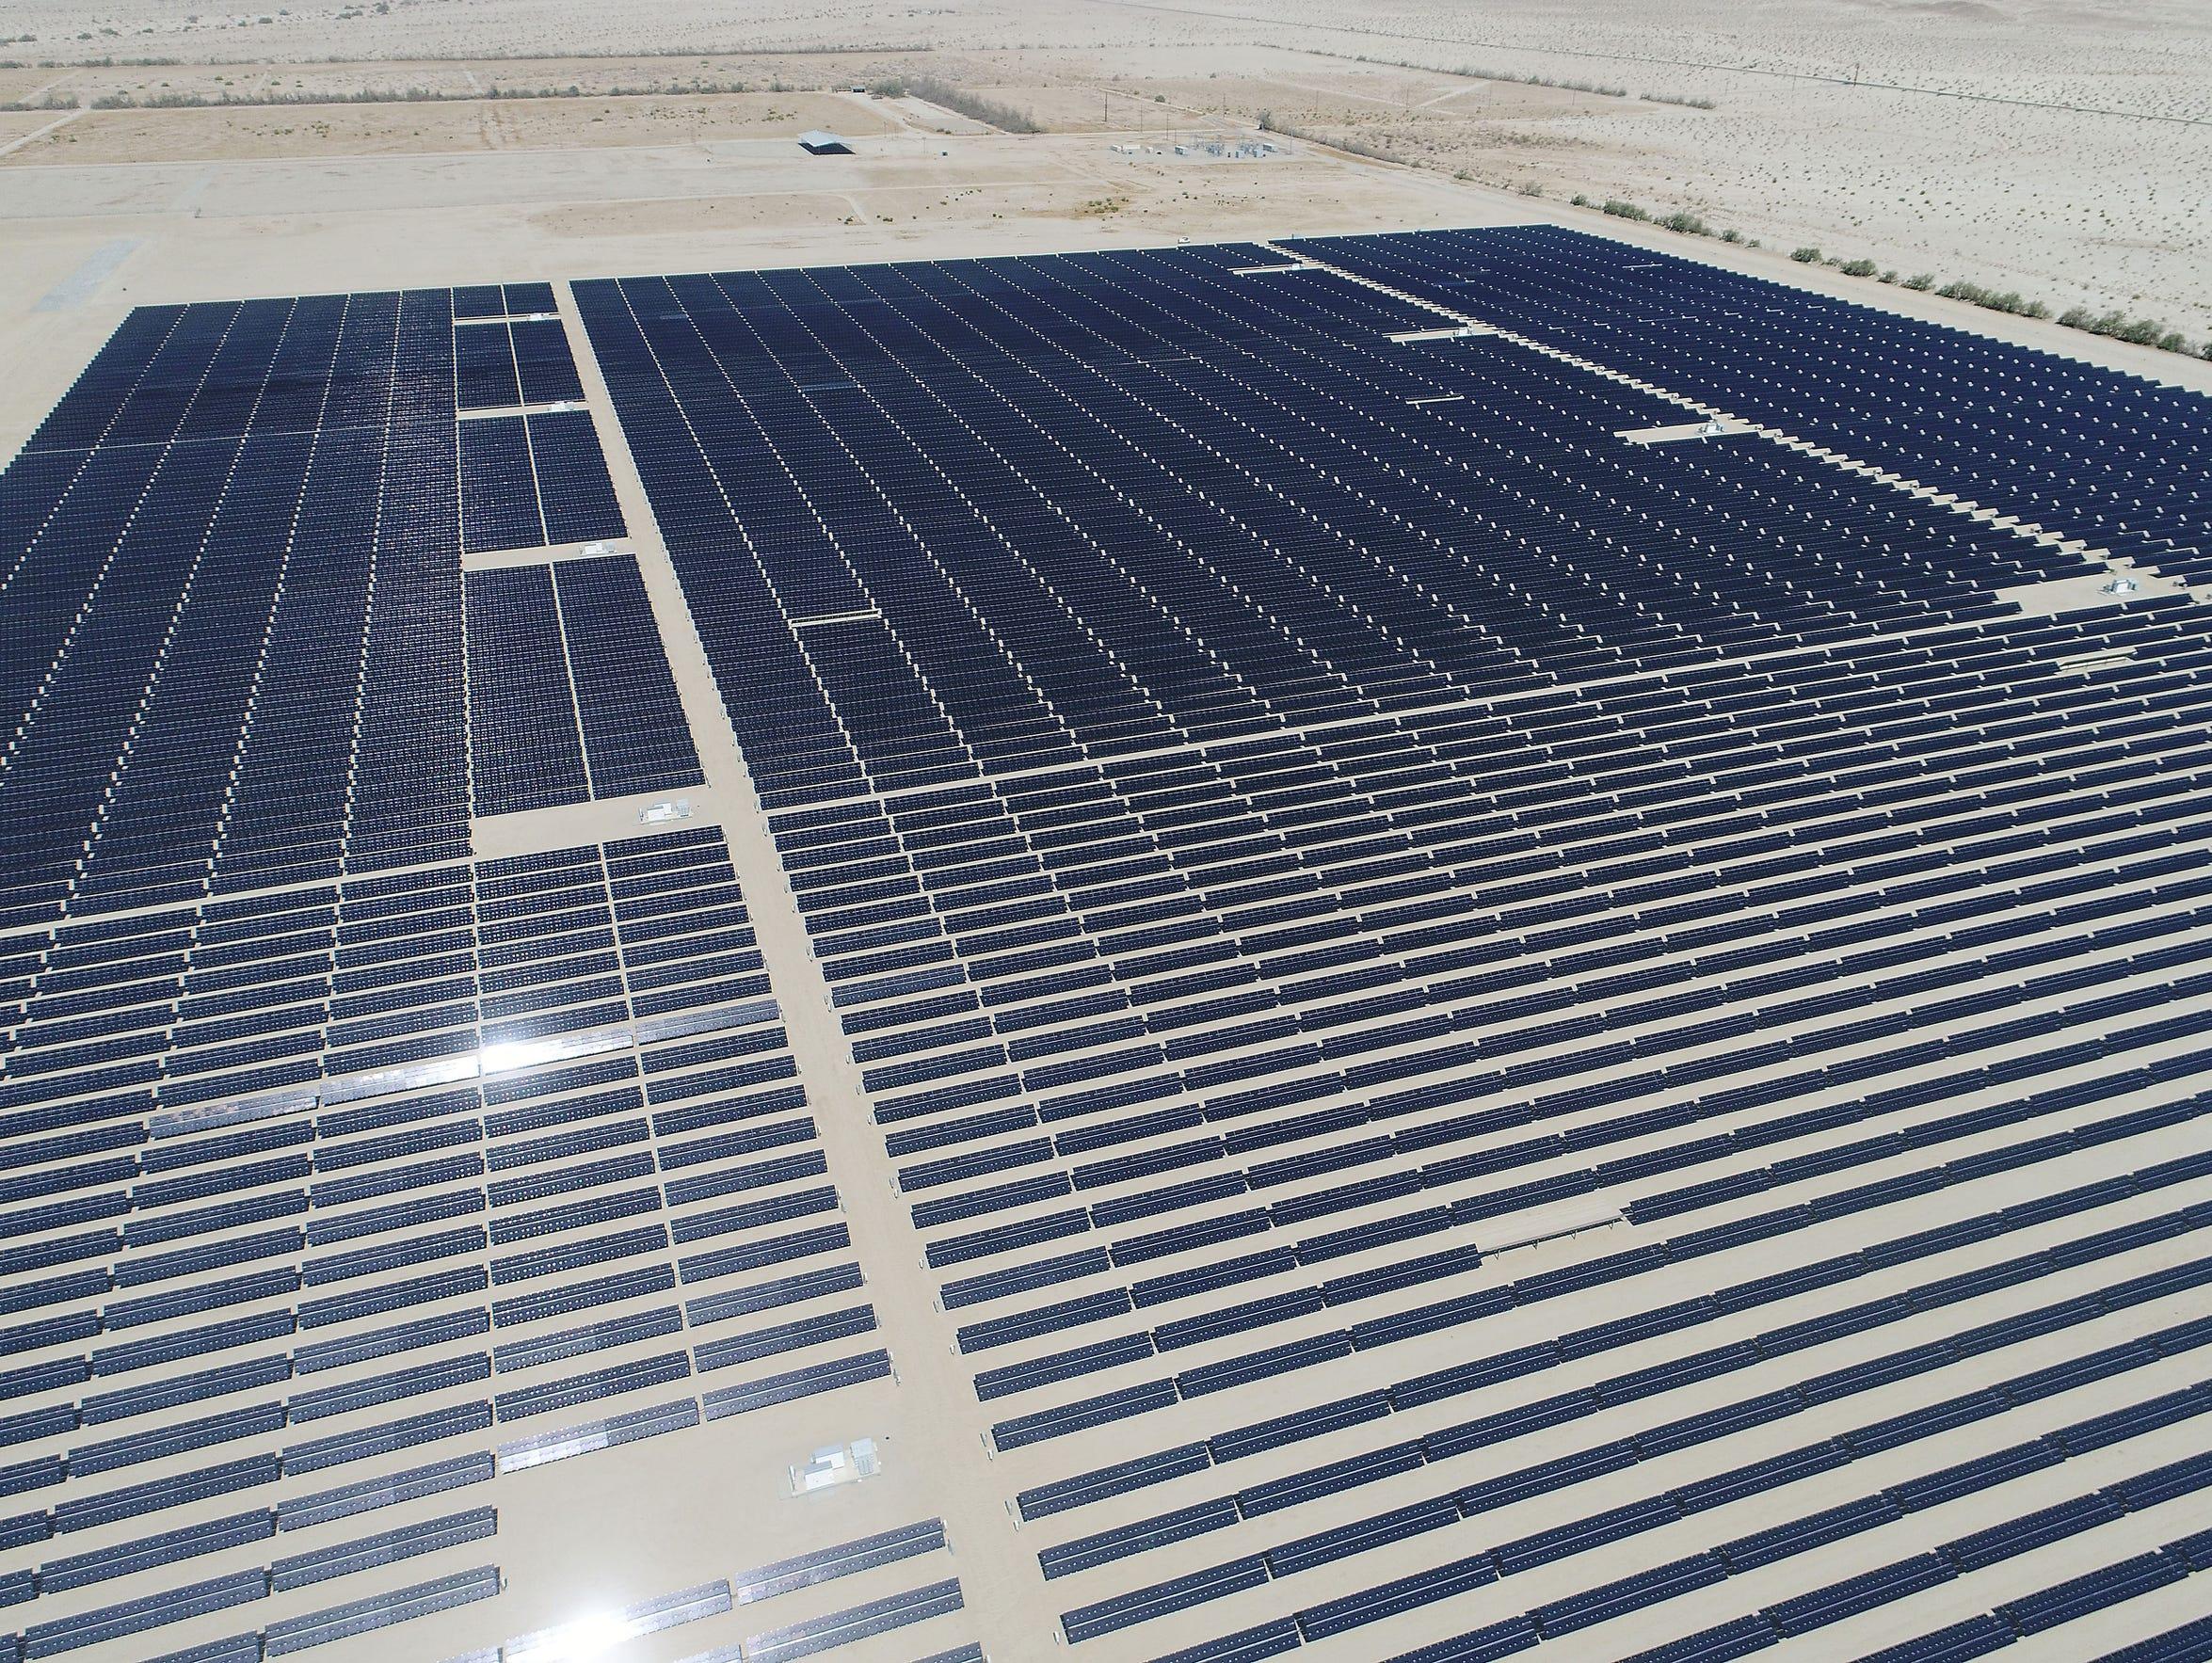 Solar panels generate electricity at the 50-megawatt